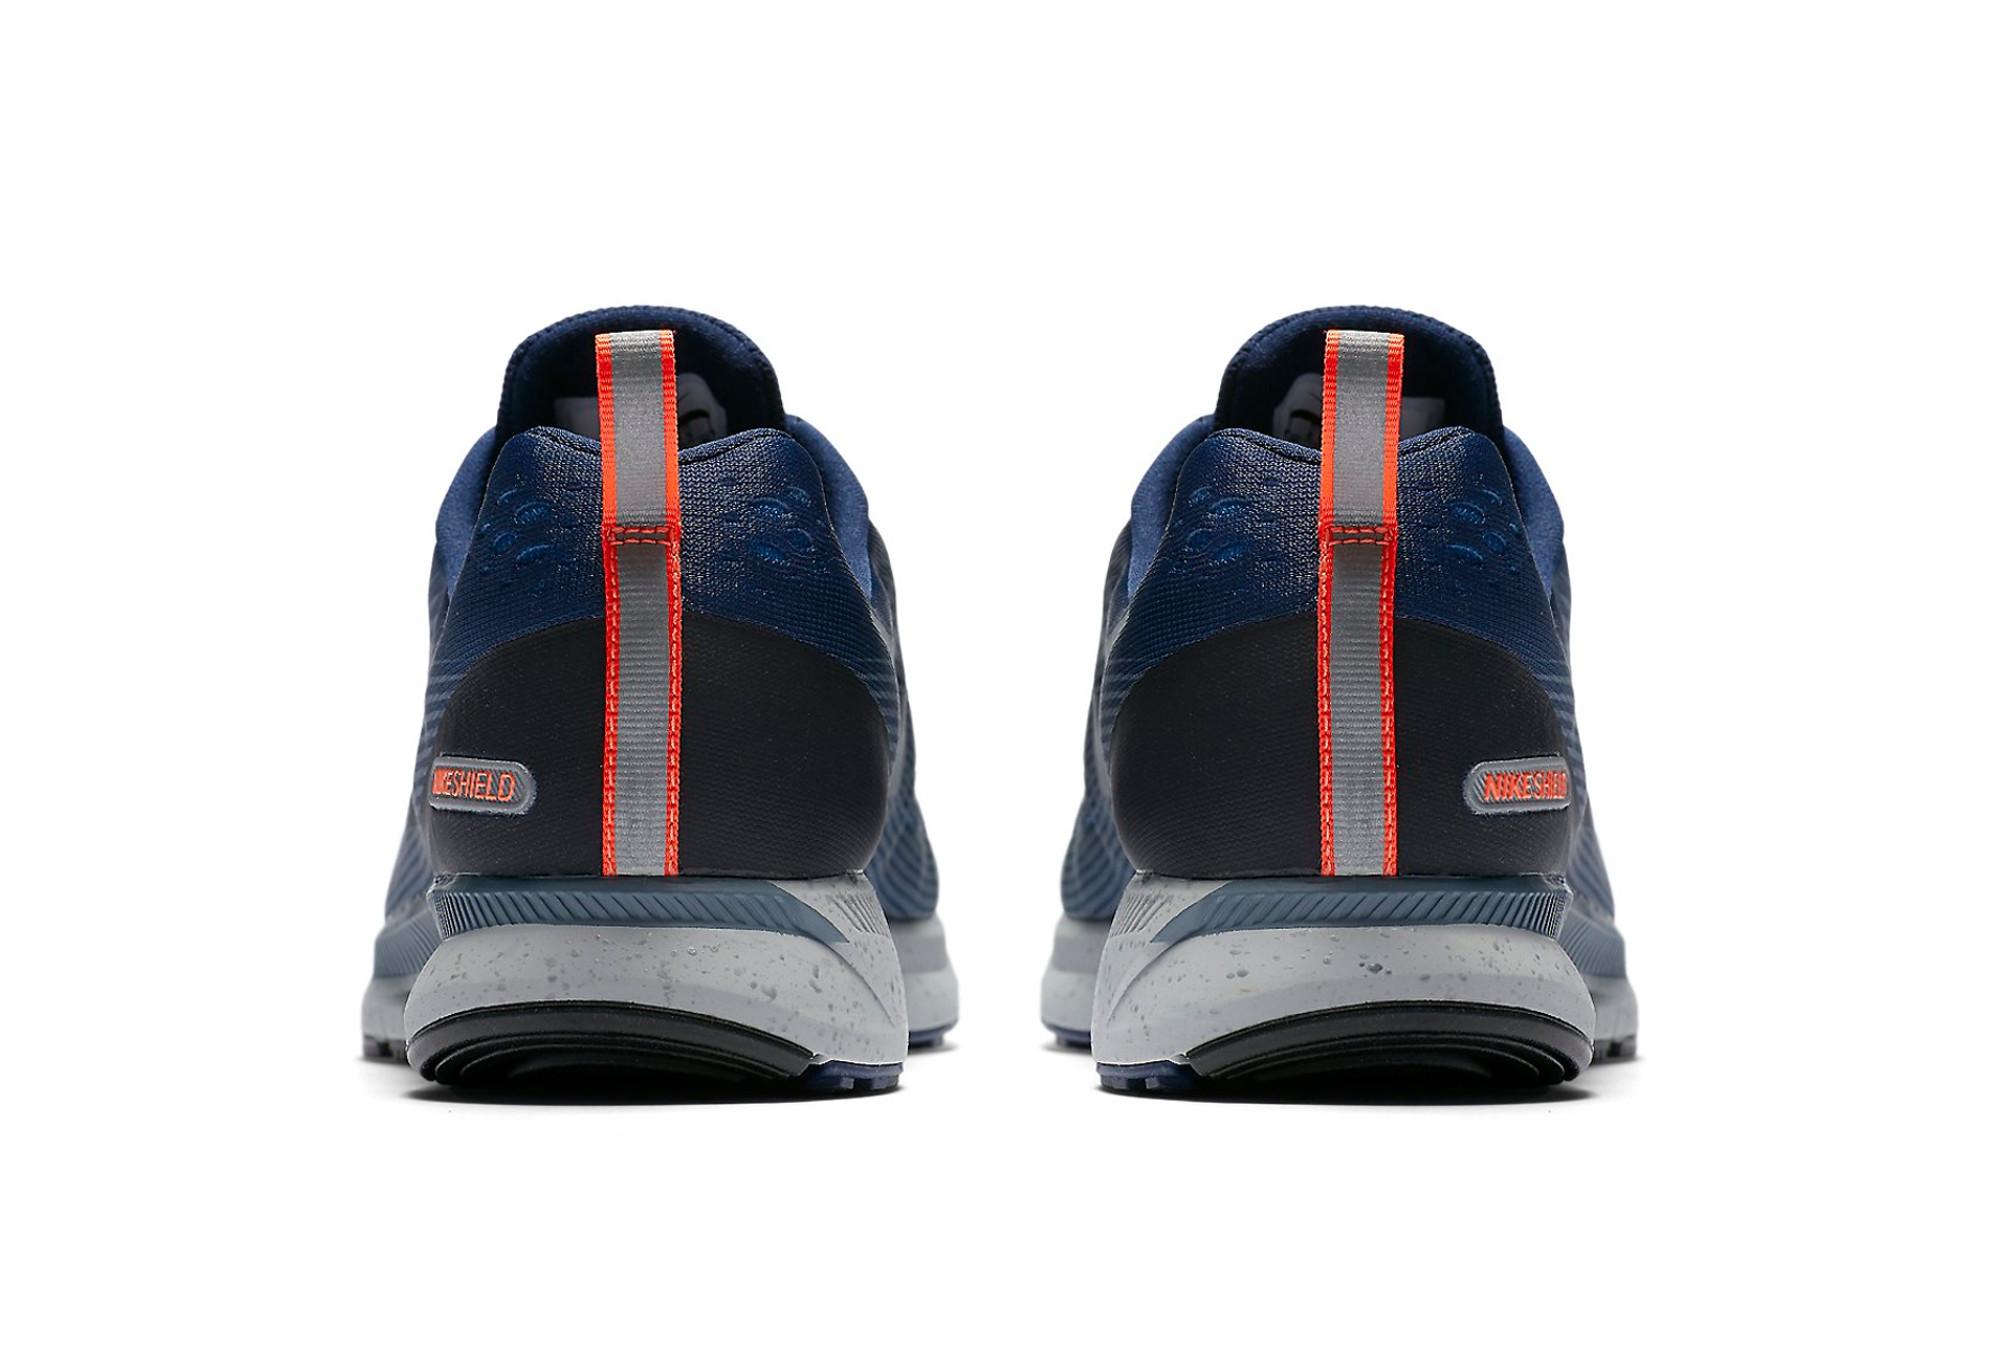 low priced 1b0aa 60d07 Nike Air Zoom Pegasus 34 Shield Blue Men